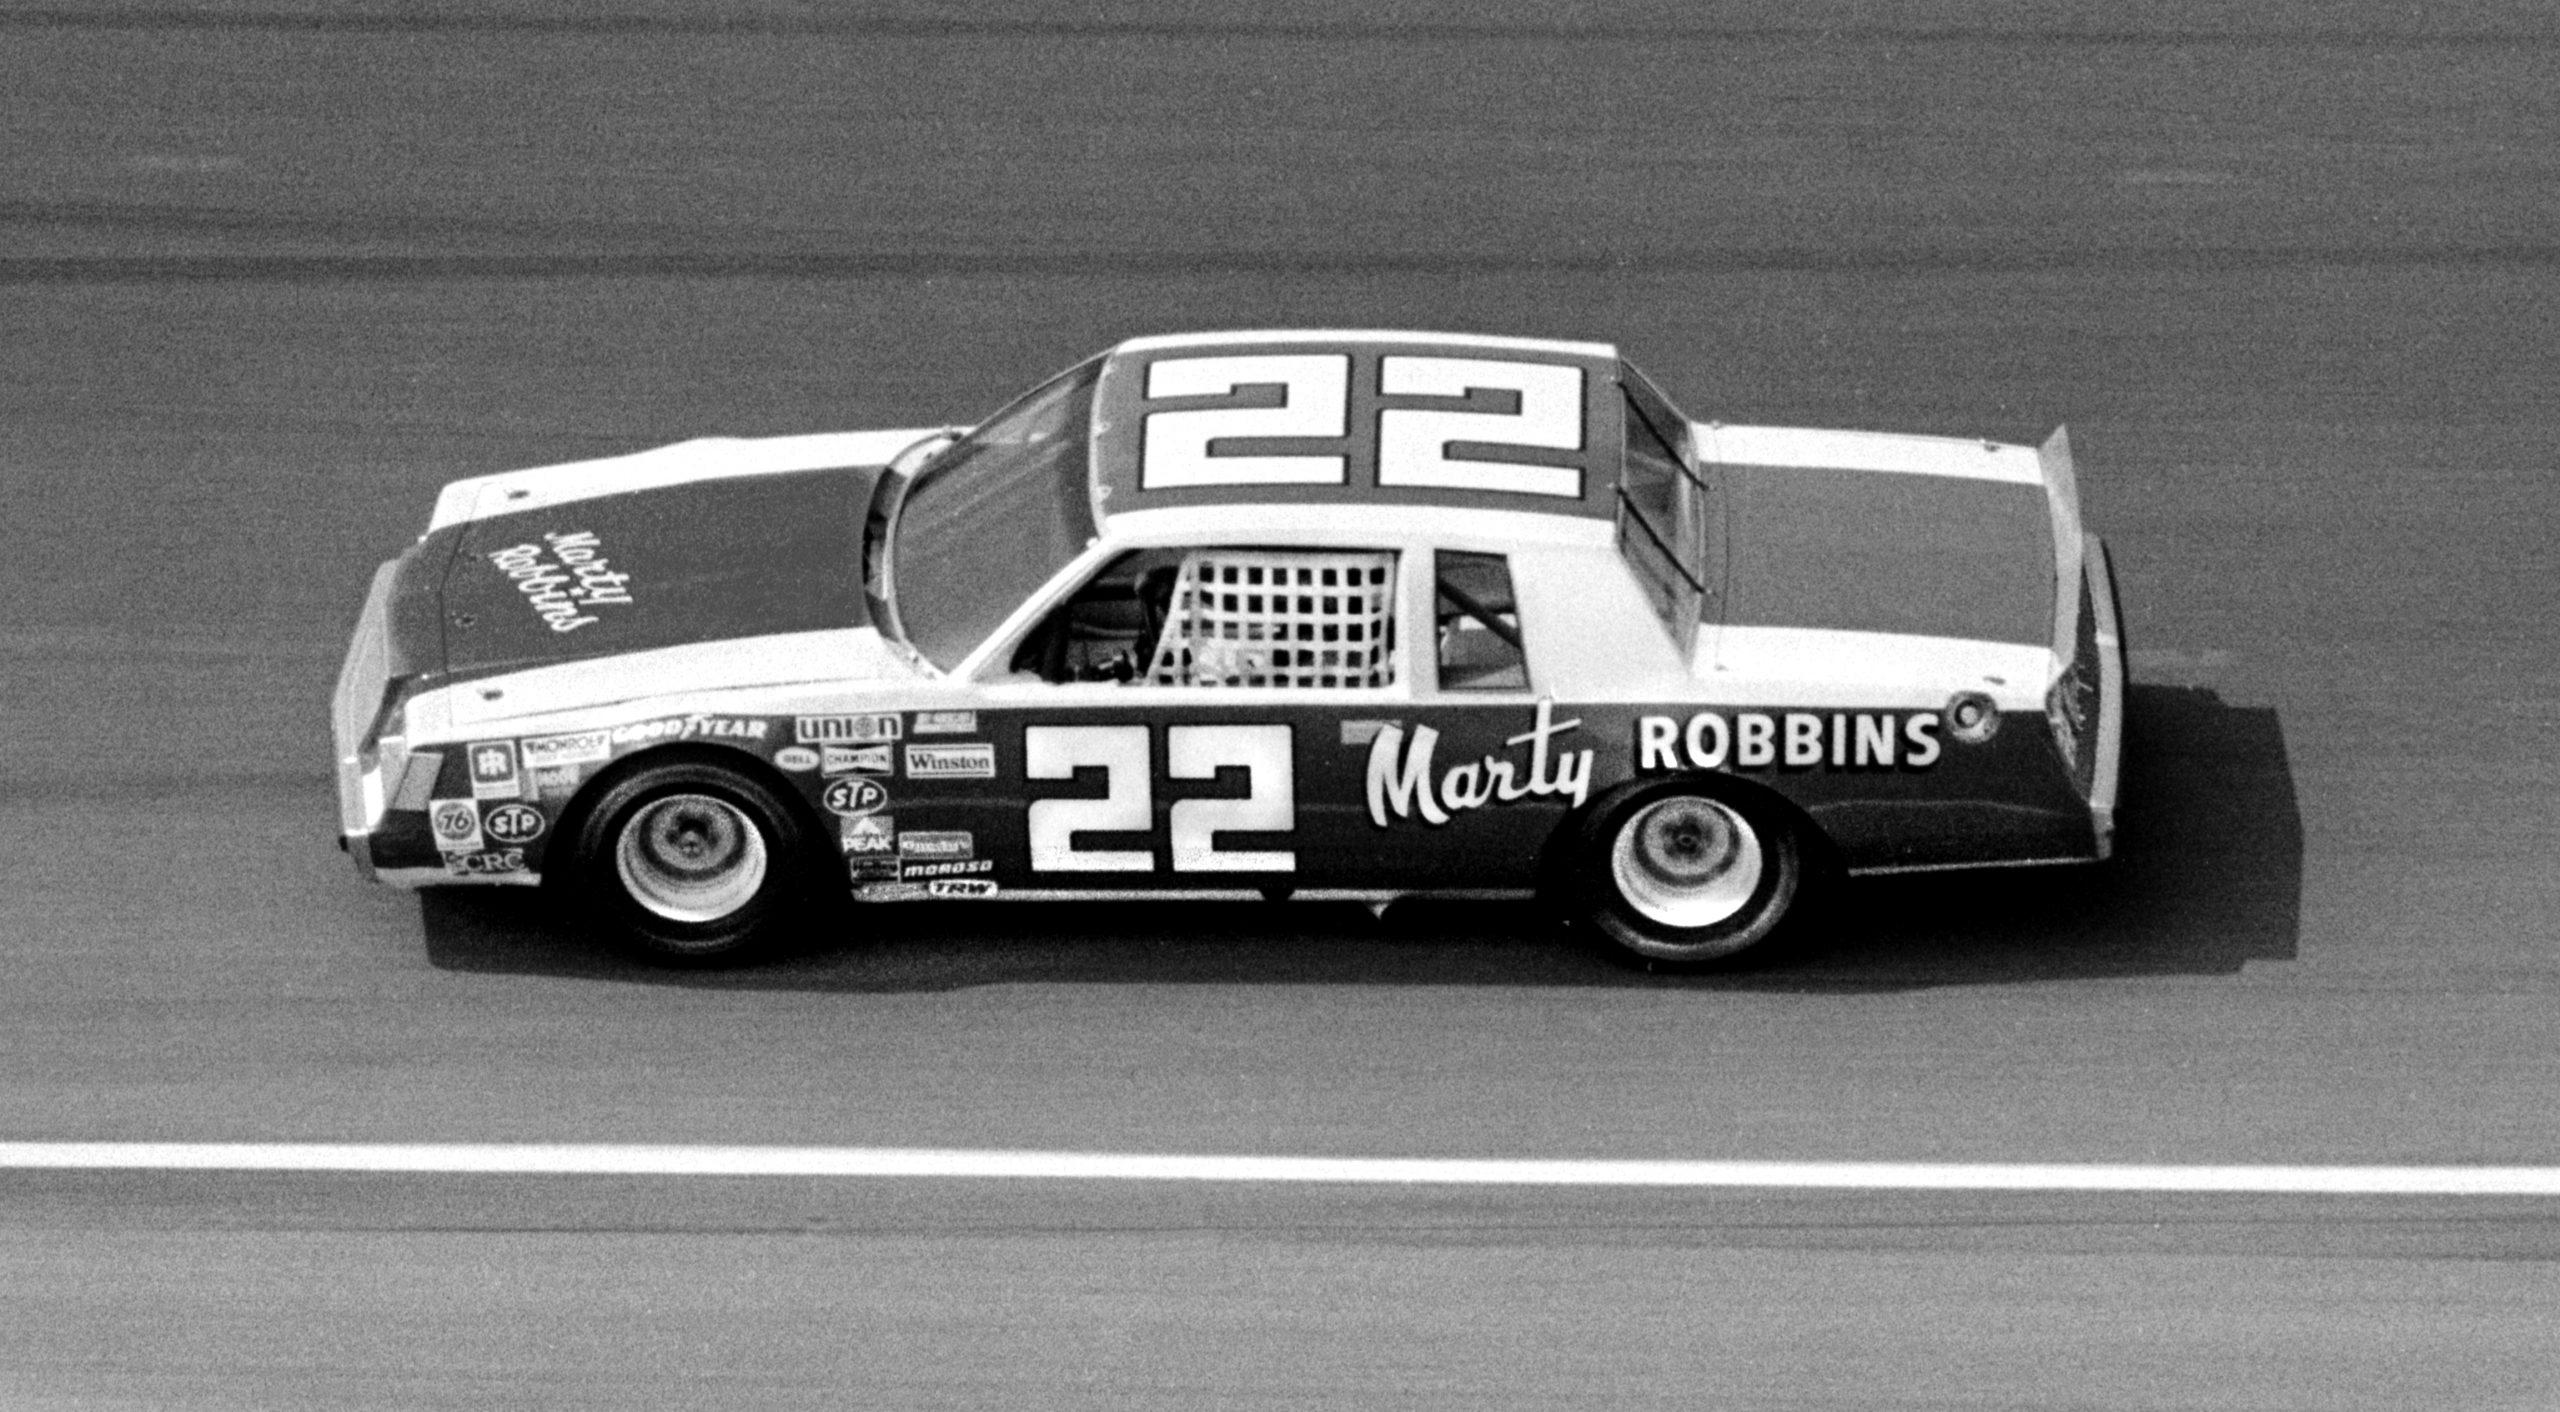 Marty Robbins NASCAR 1982 Firecracker 400 NASCAR race